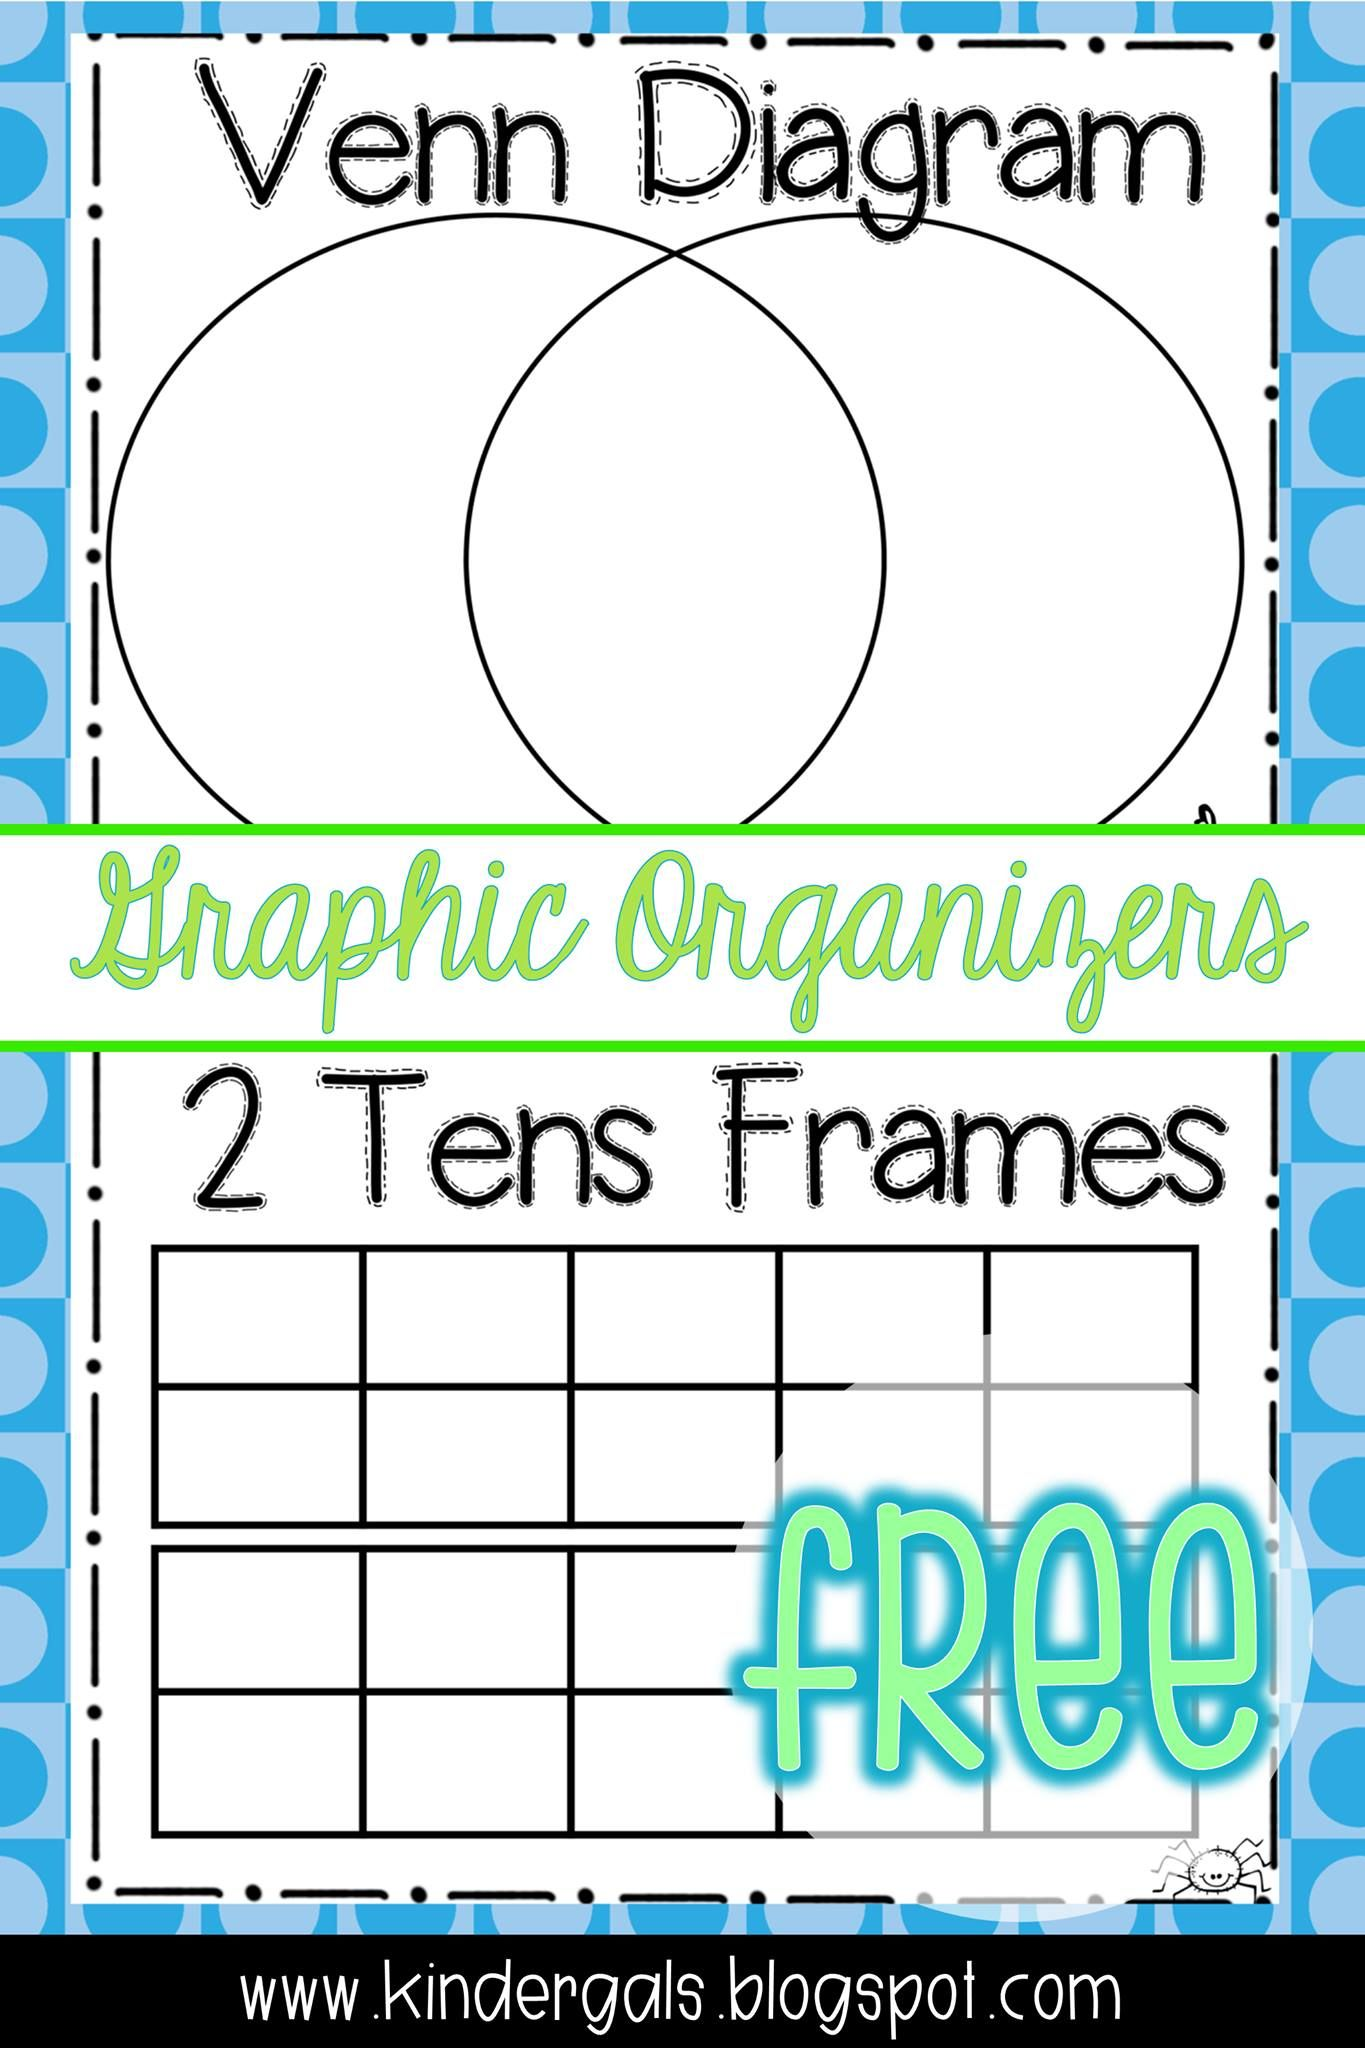 hight resolution of venn diagram and 2 tens frames free downloads for kindergarten teachers